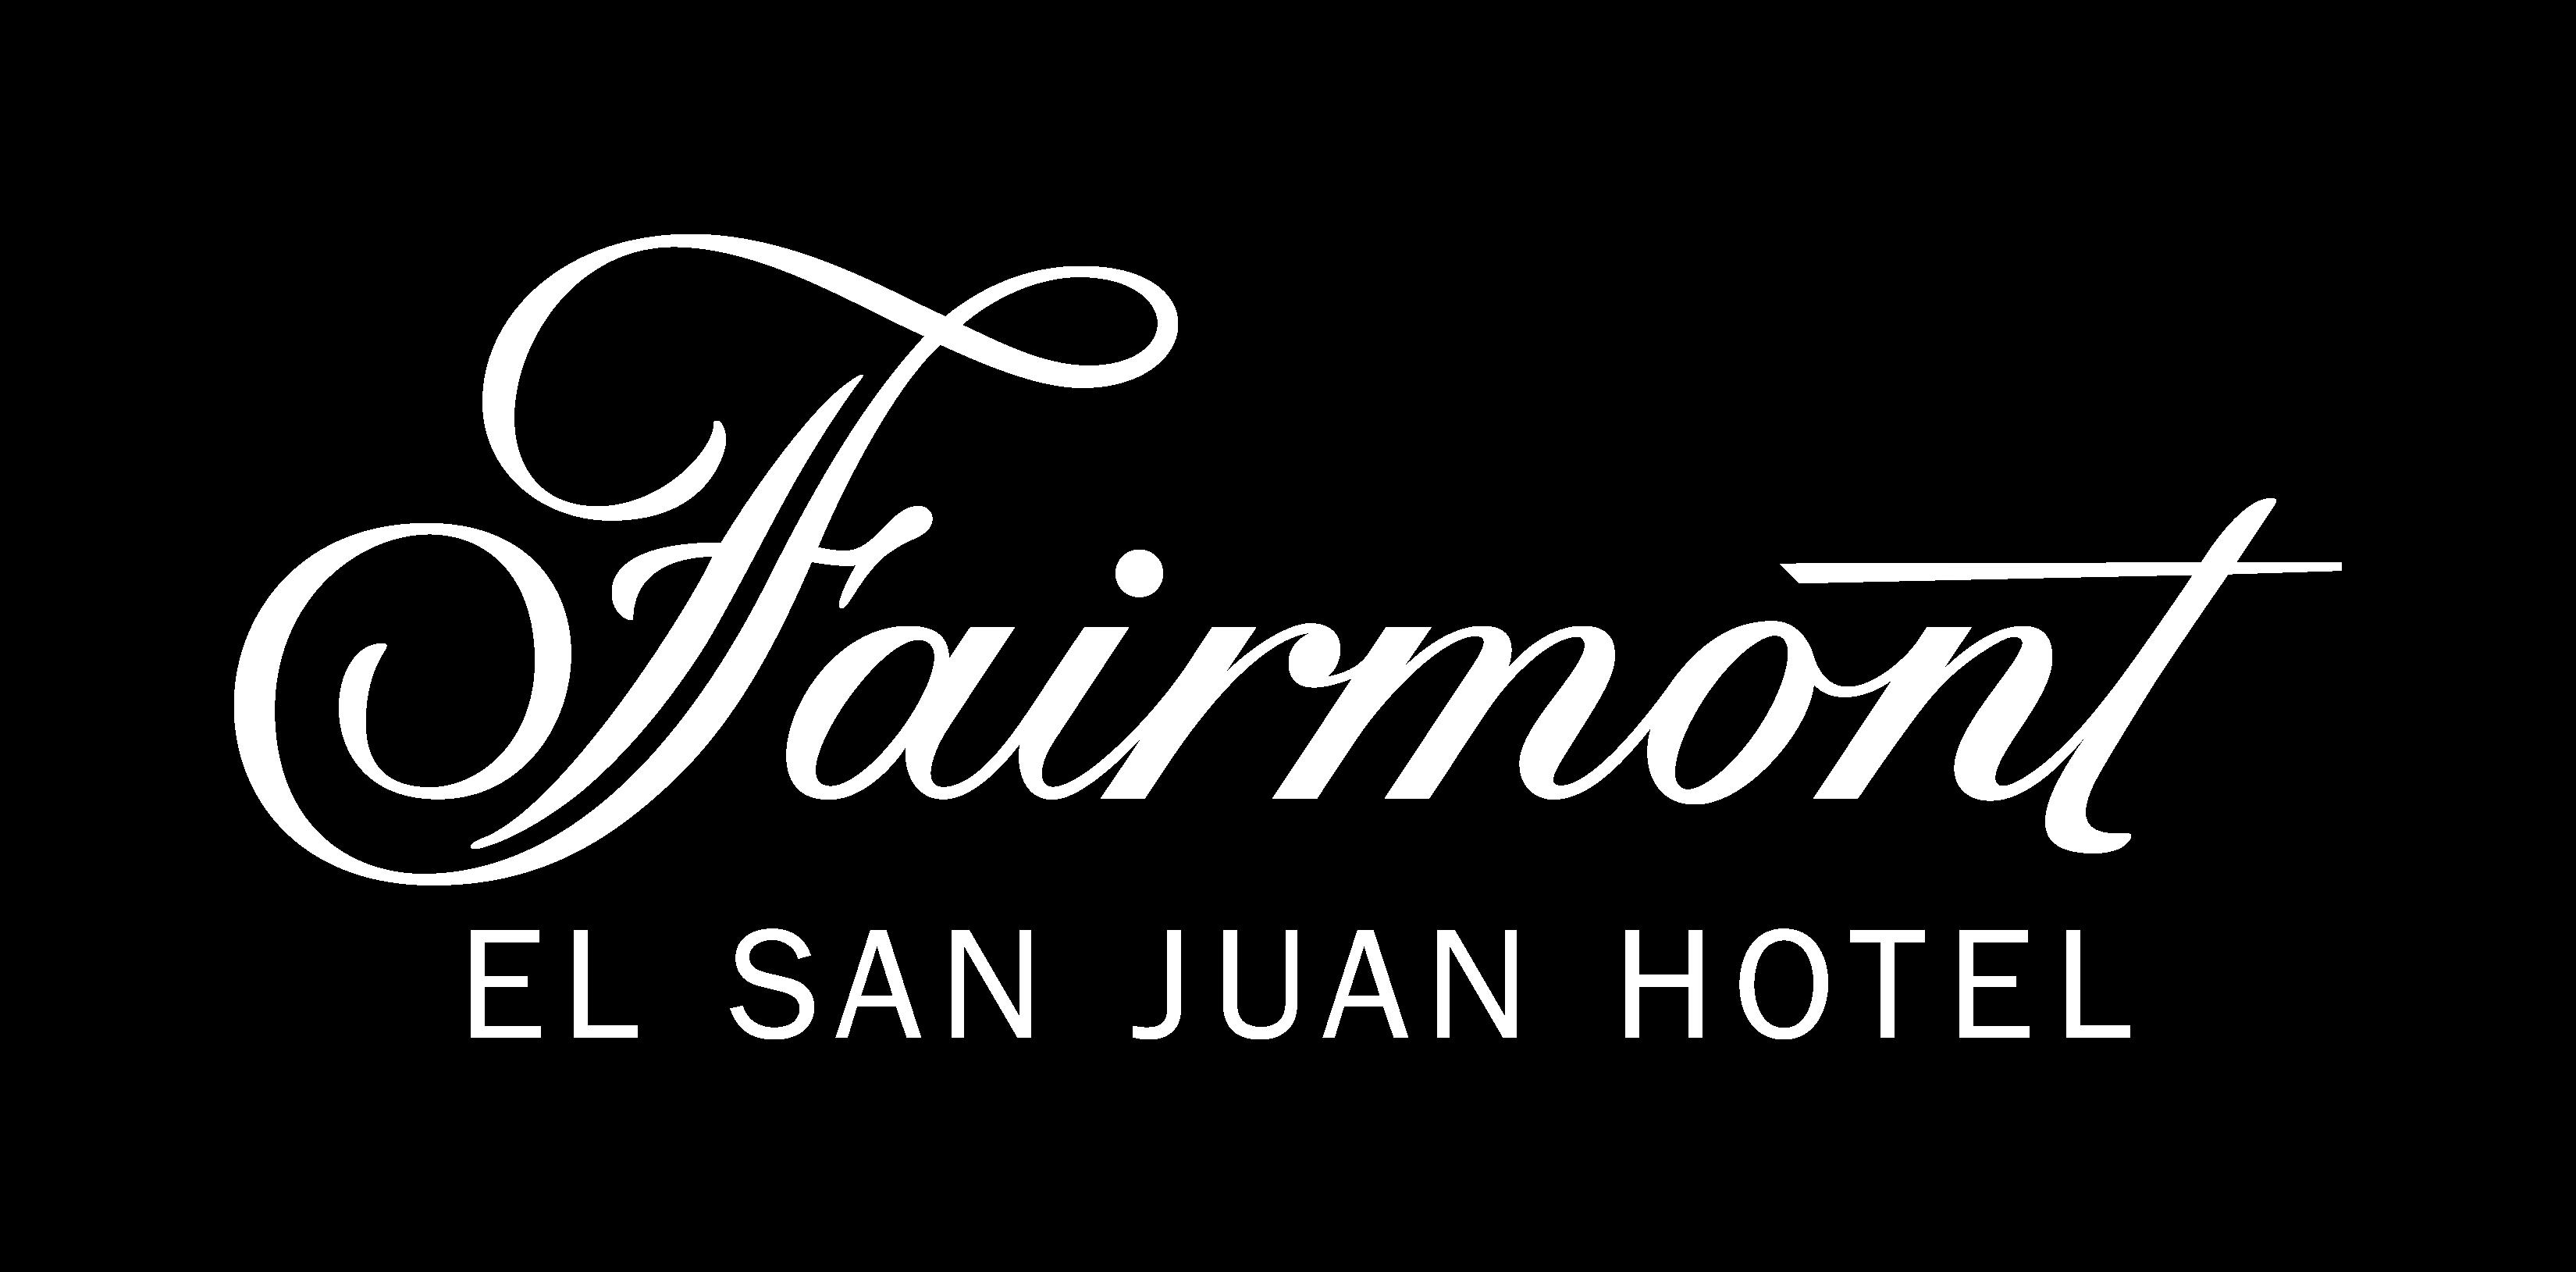 Logo for Fairmont El San Juan Hotel